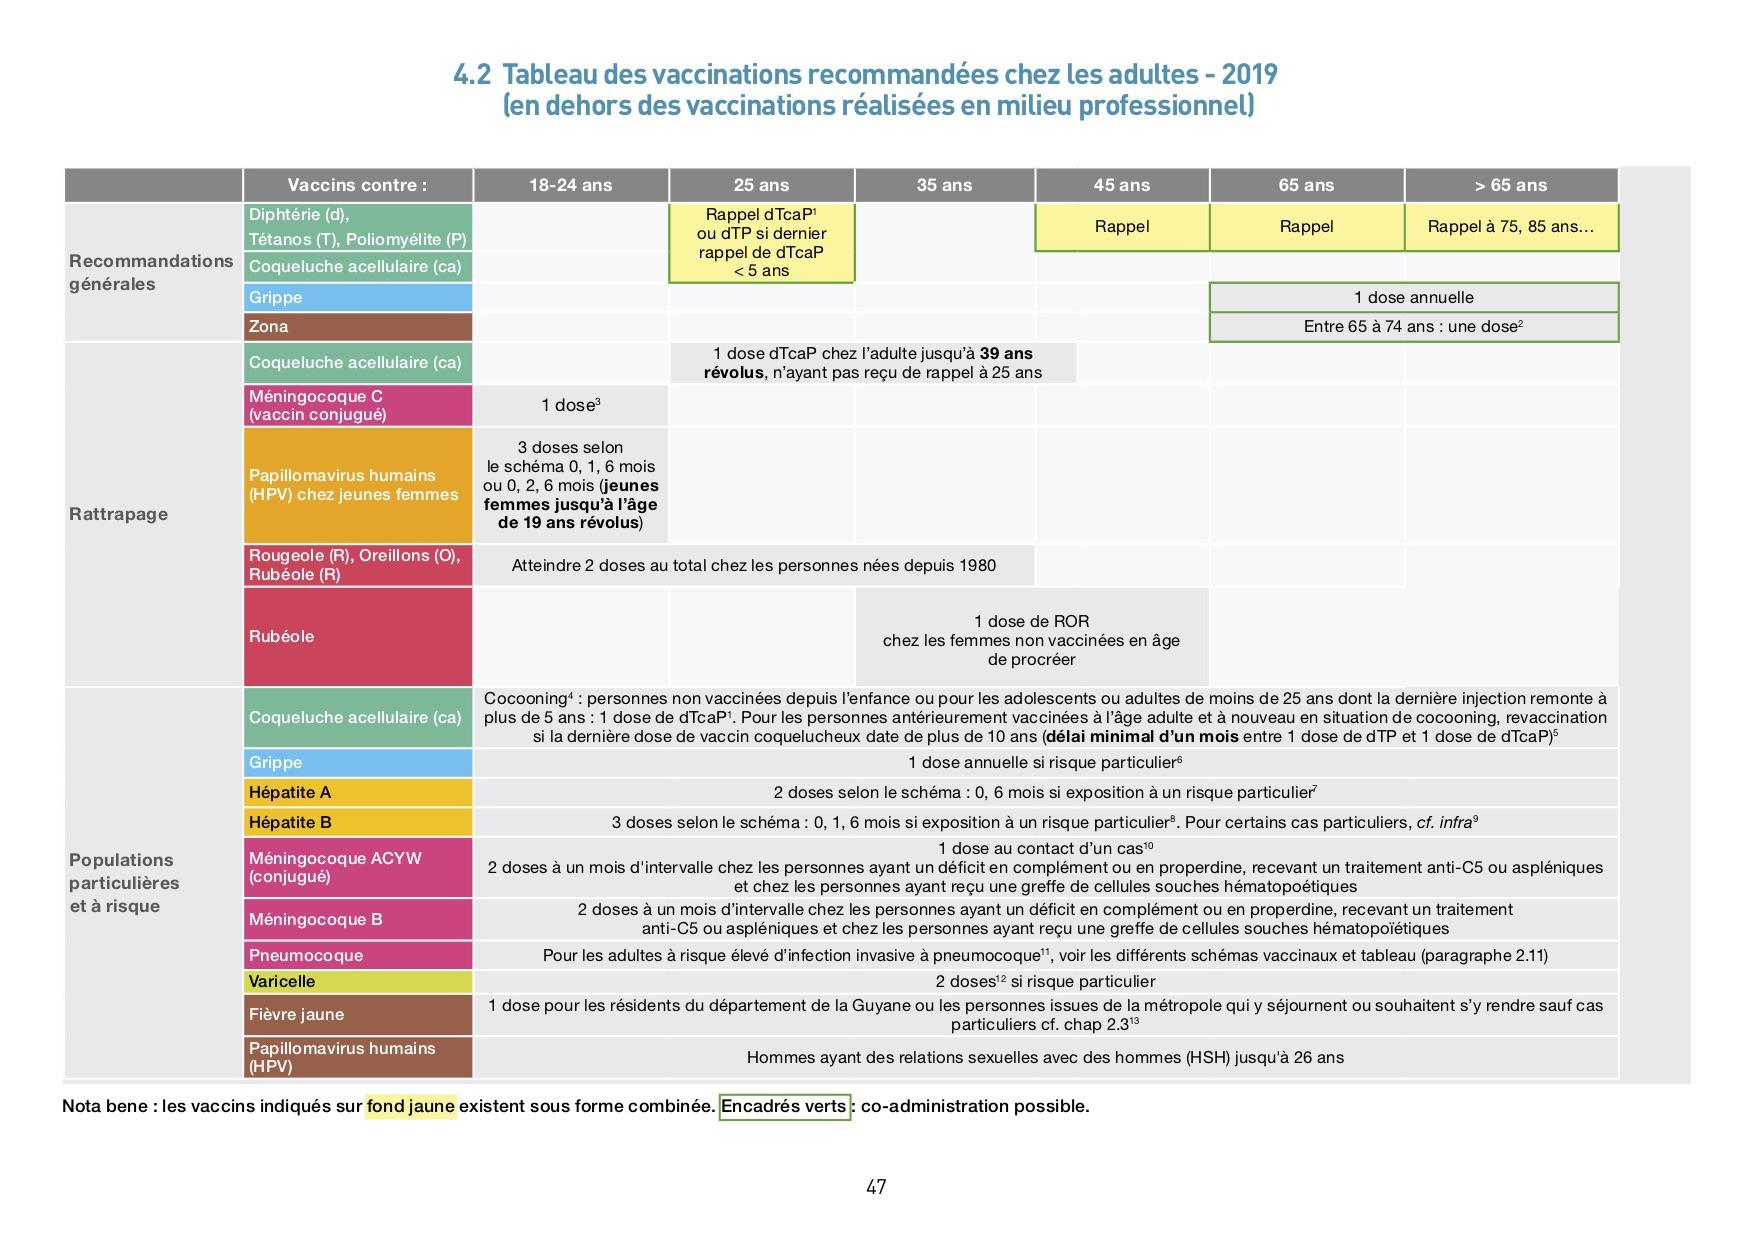 Vaccination Calendrier 2019.Le Calendrier Vaccinal 2019 Est La